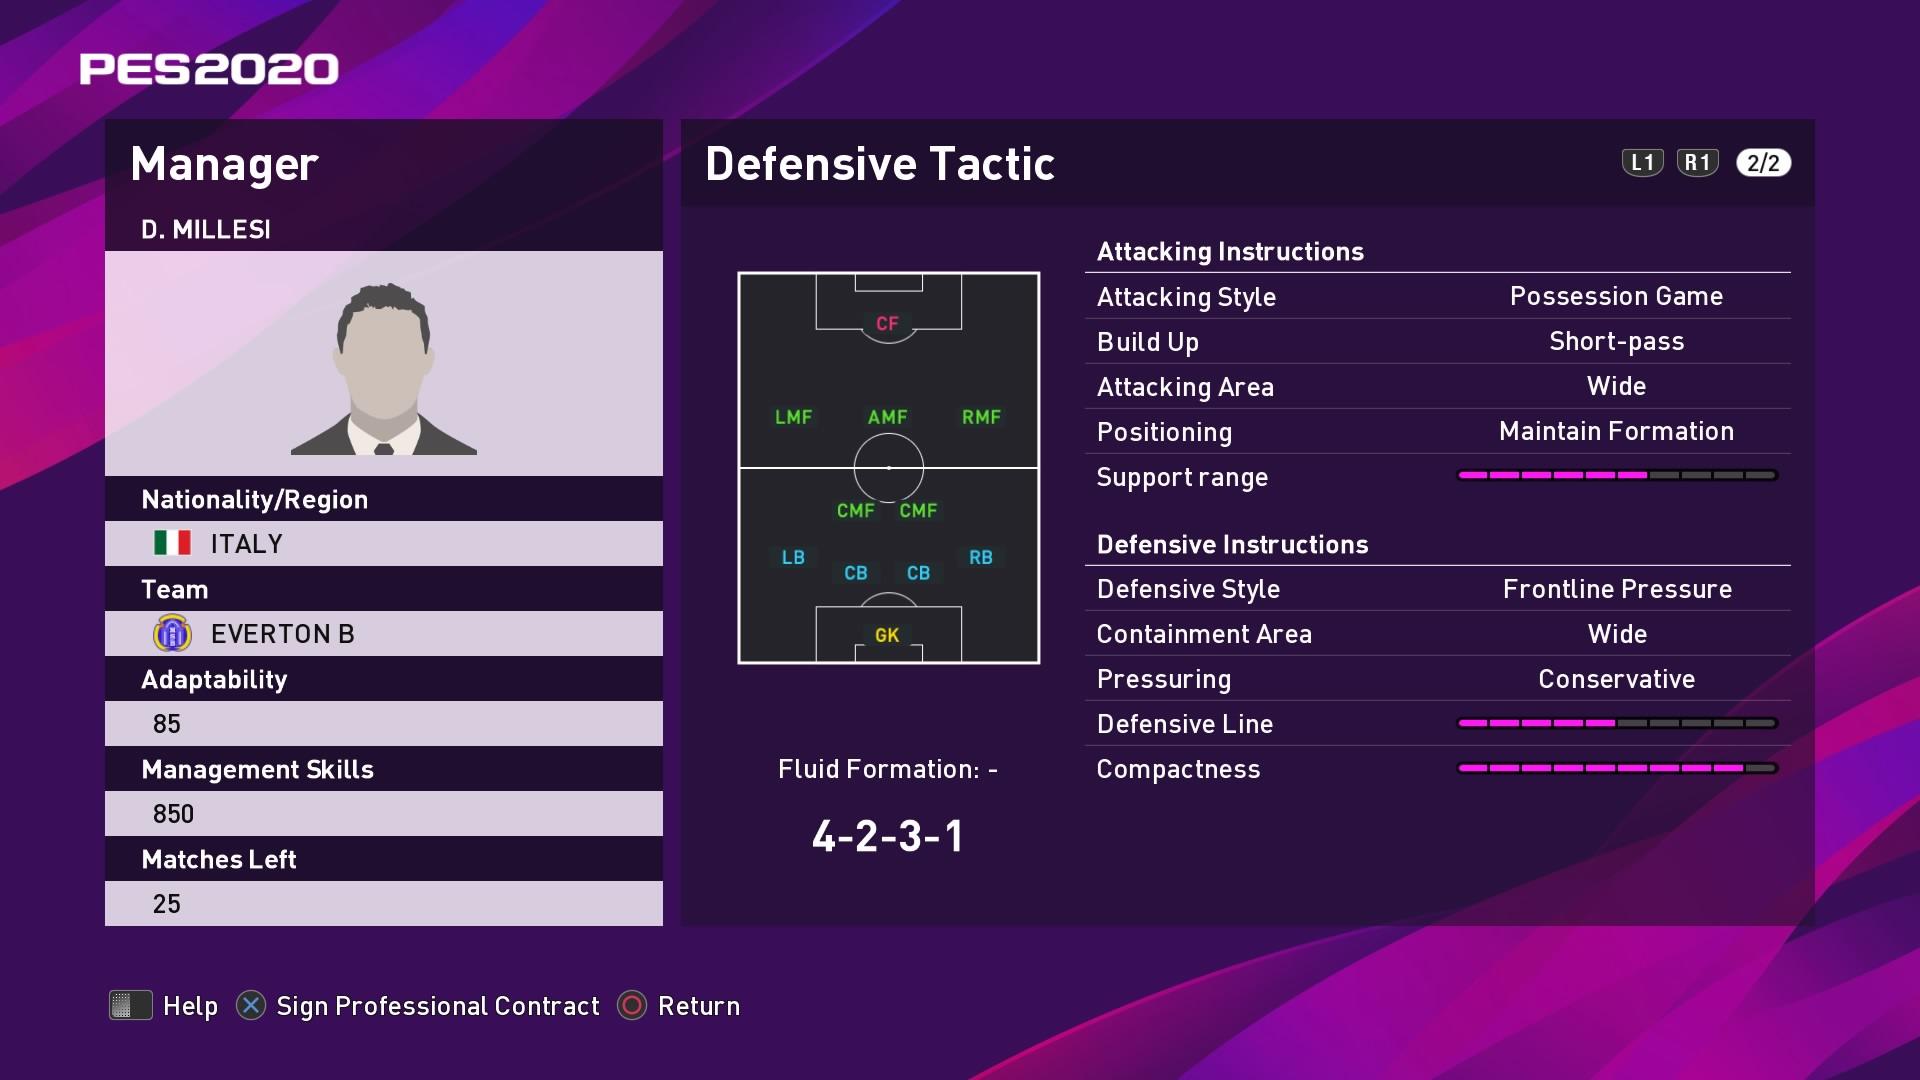 D. Millesi (4) (Carlo Ancelotti) Defensive Tactic in PES 2020 myClub